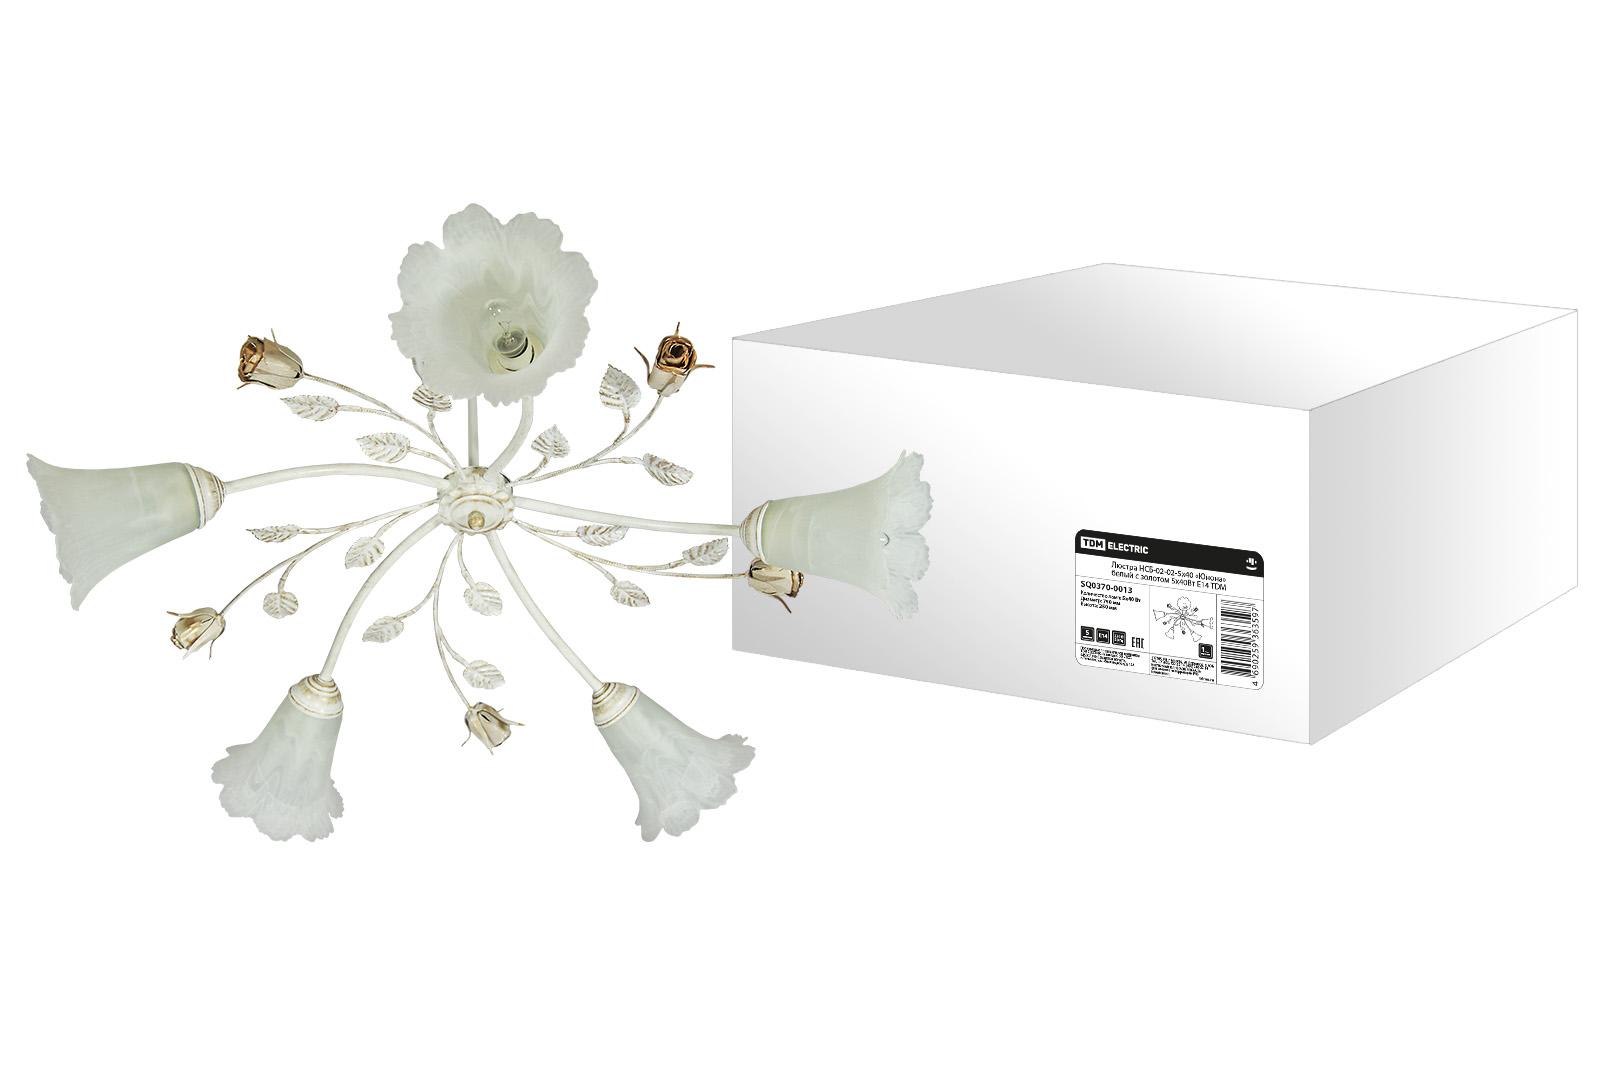 Фото Люстра НСБ-02-02-5х40 «Юнона» белый с золотом 5х40Вт E14 TDM {SQ0370-0013}